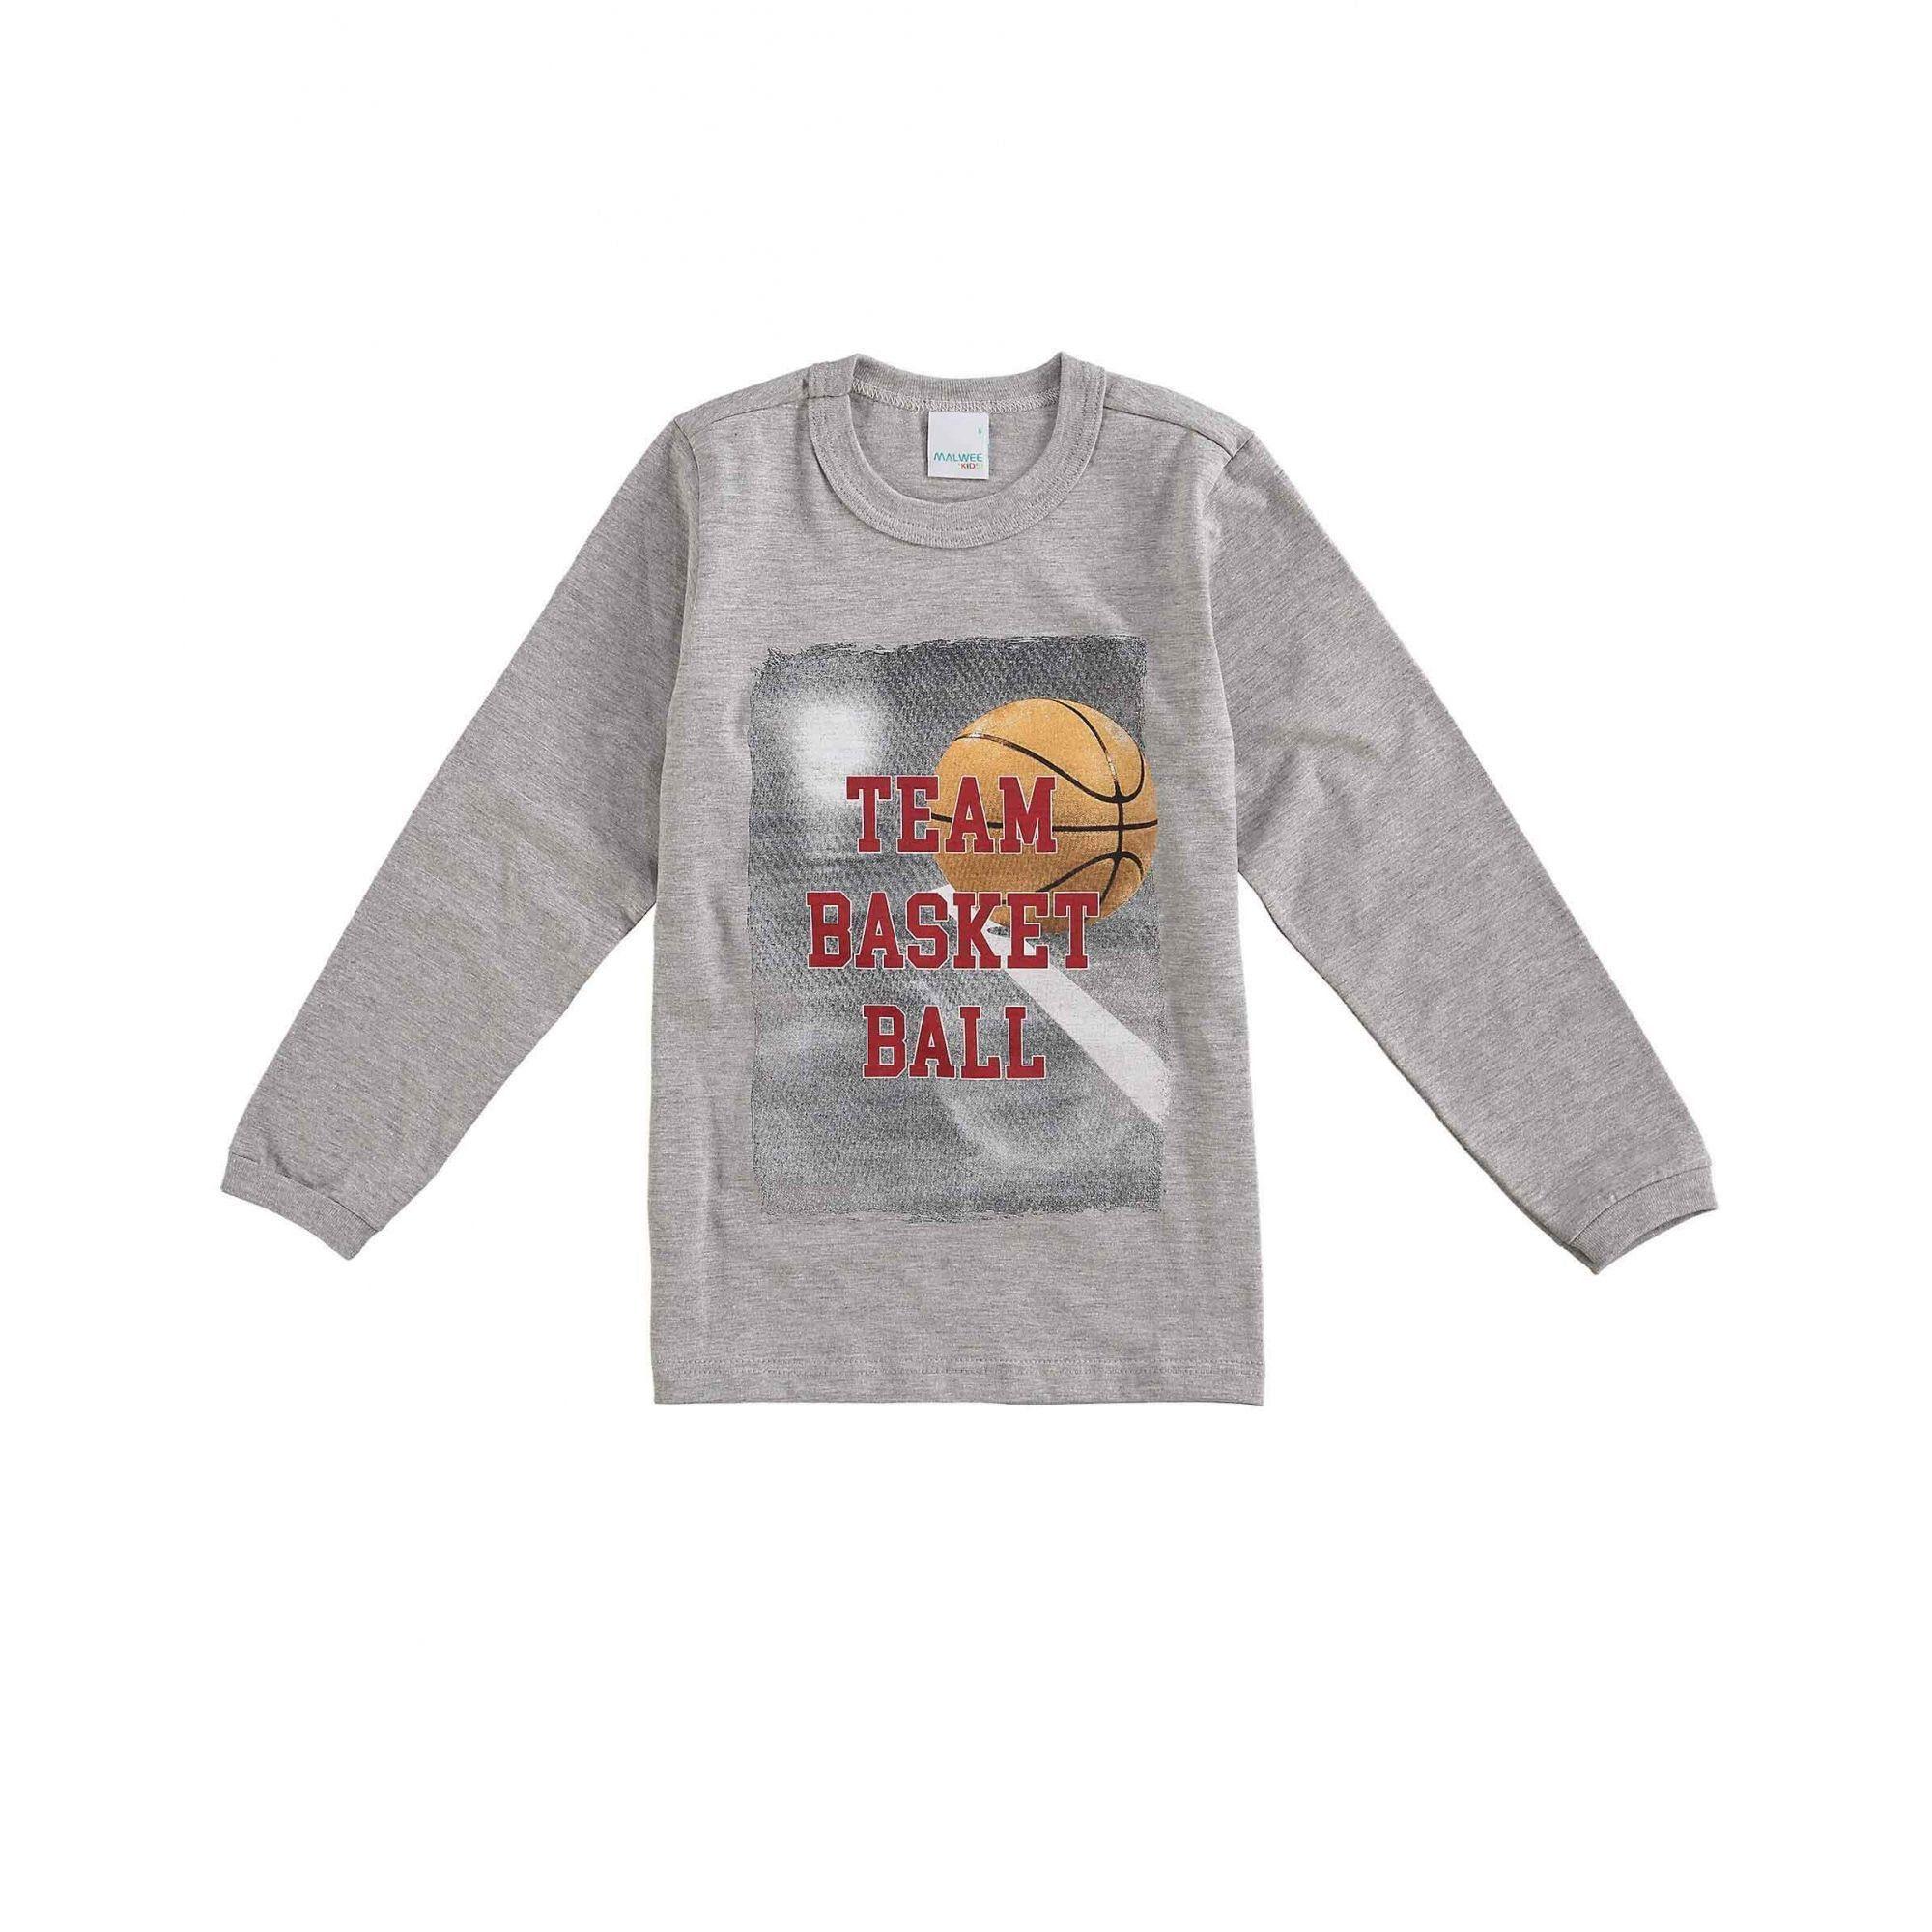 Camiseta Infantil Masculina Inverno Cinza Mescla Ball Malwee